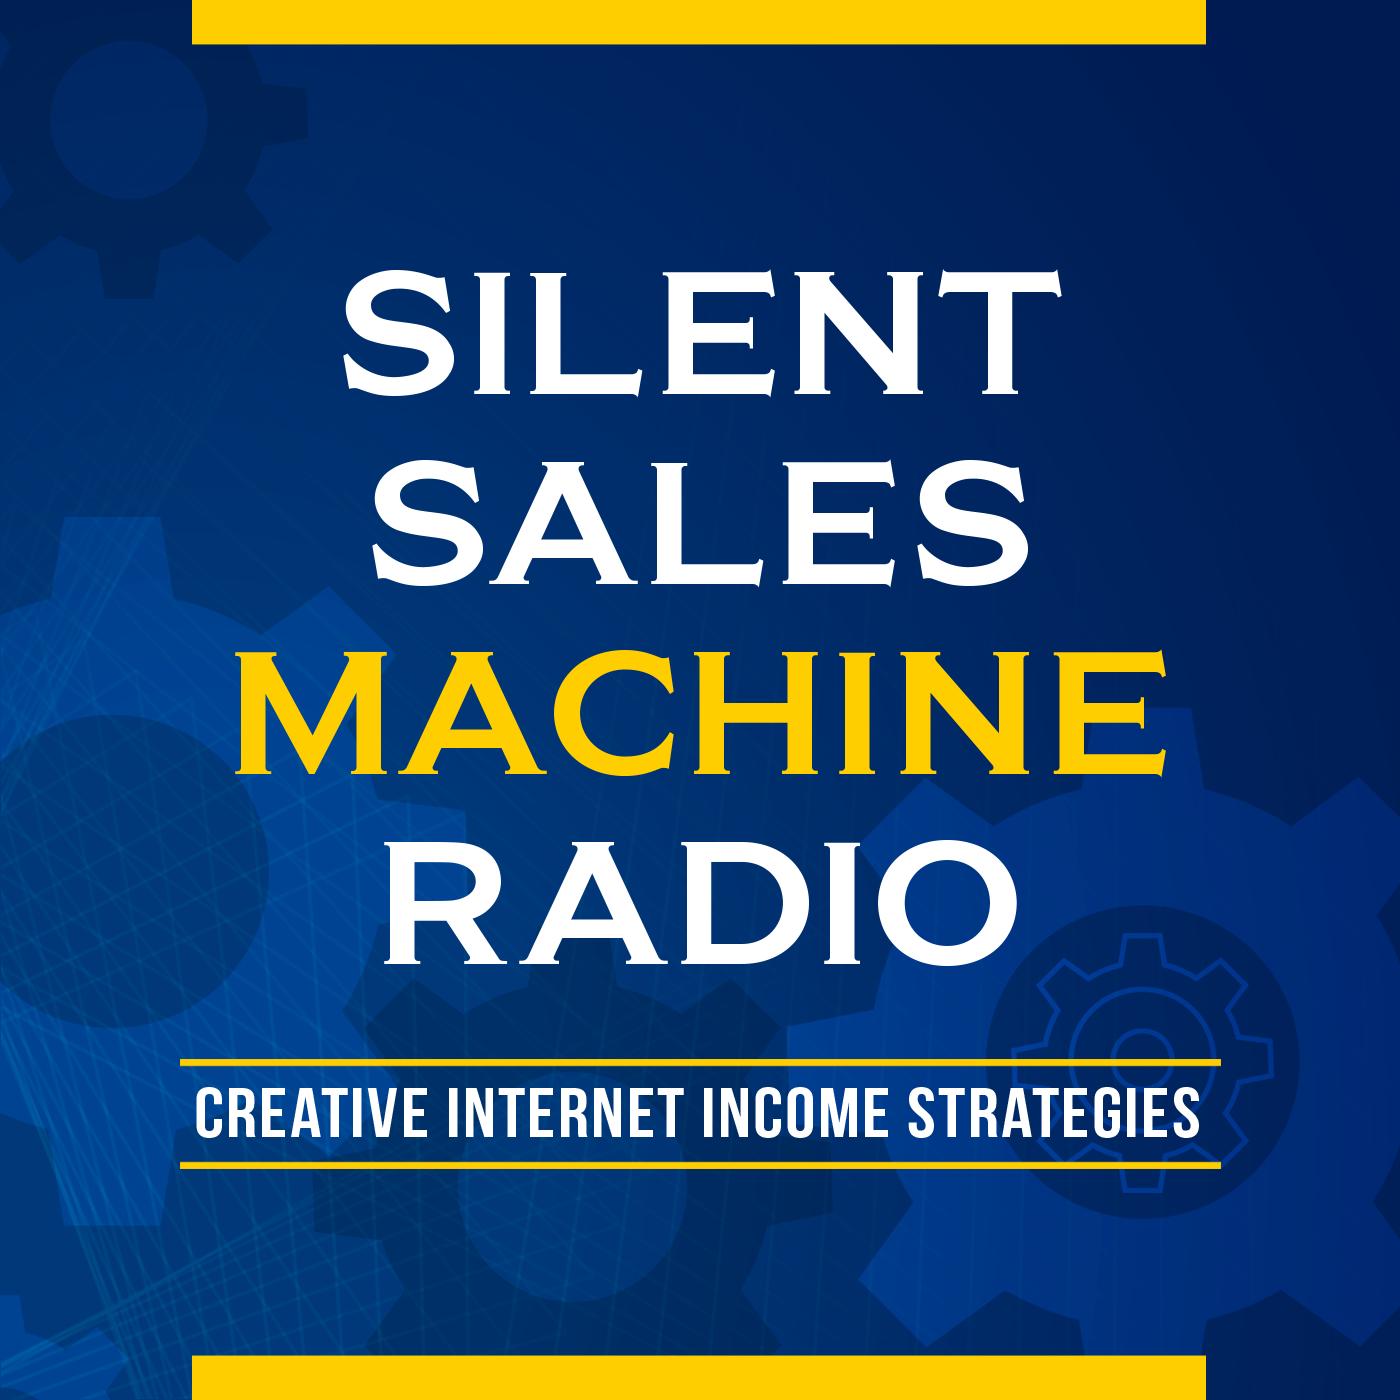 Podcast - SilentJim com - Amazon FBA Seller Training and How